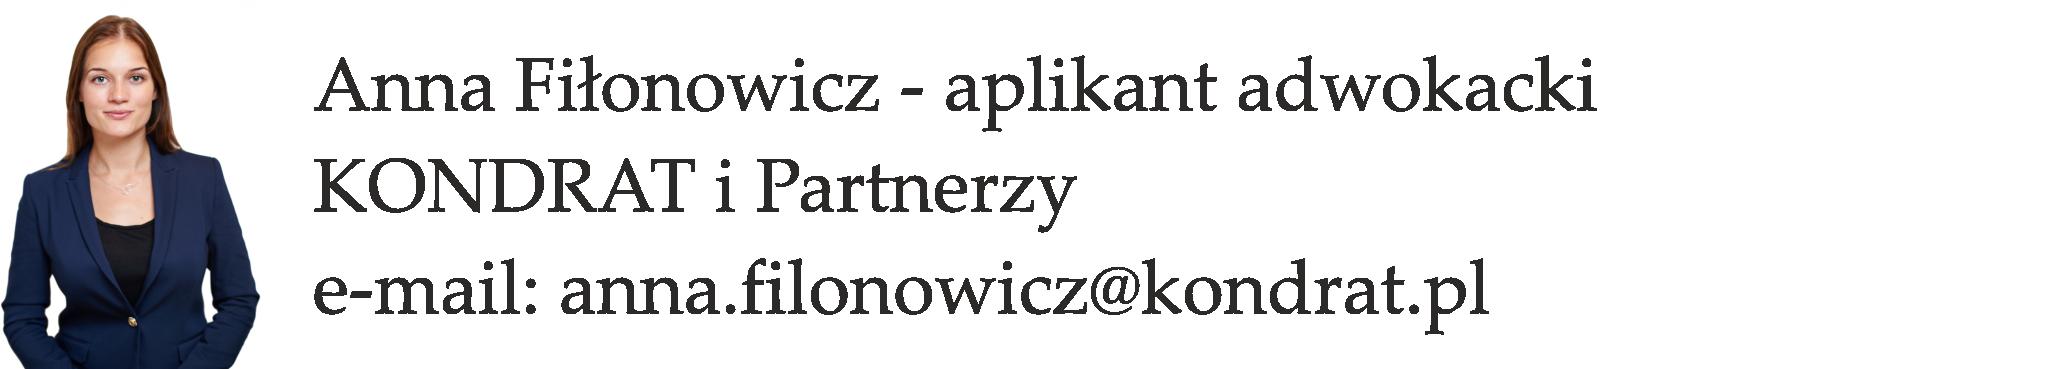 autor-anna-filonowicz